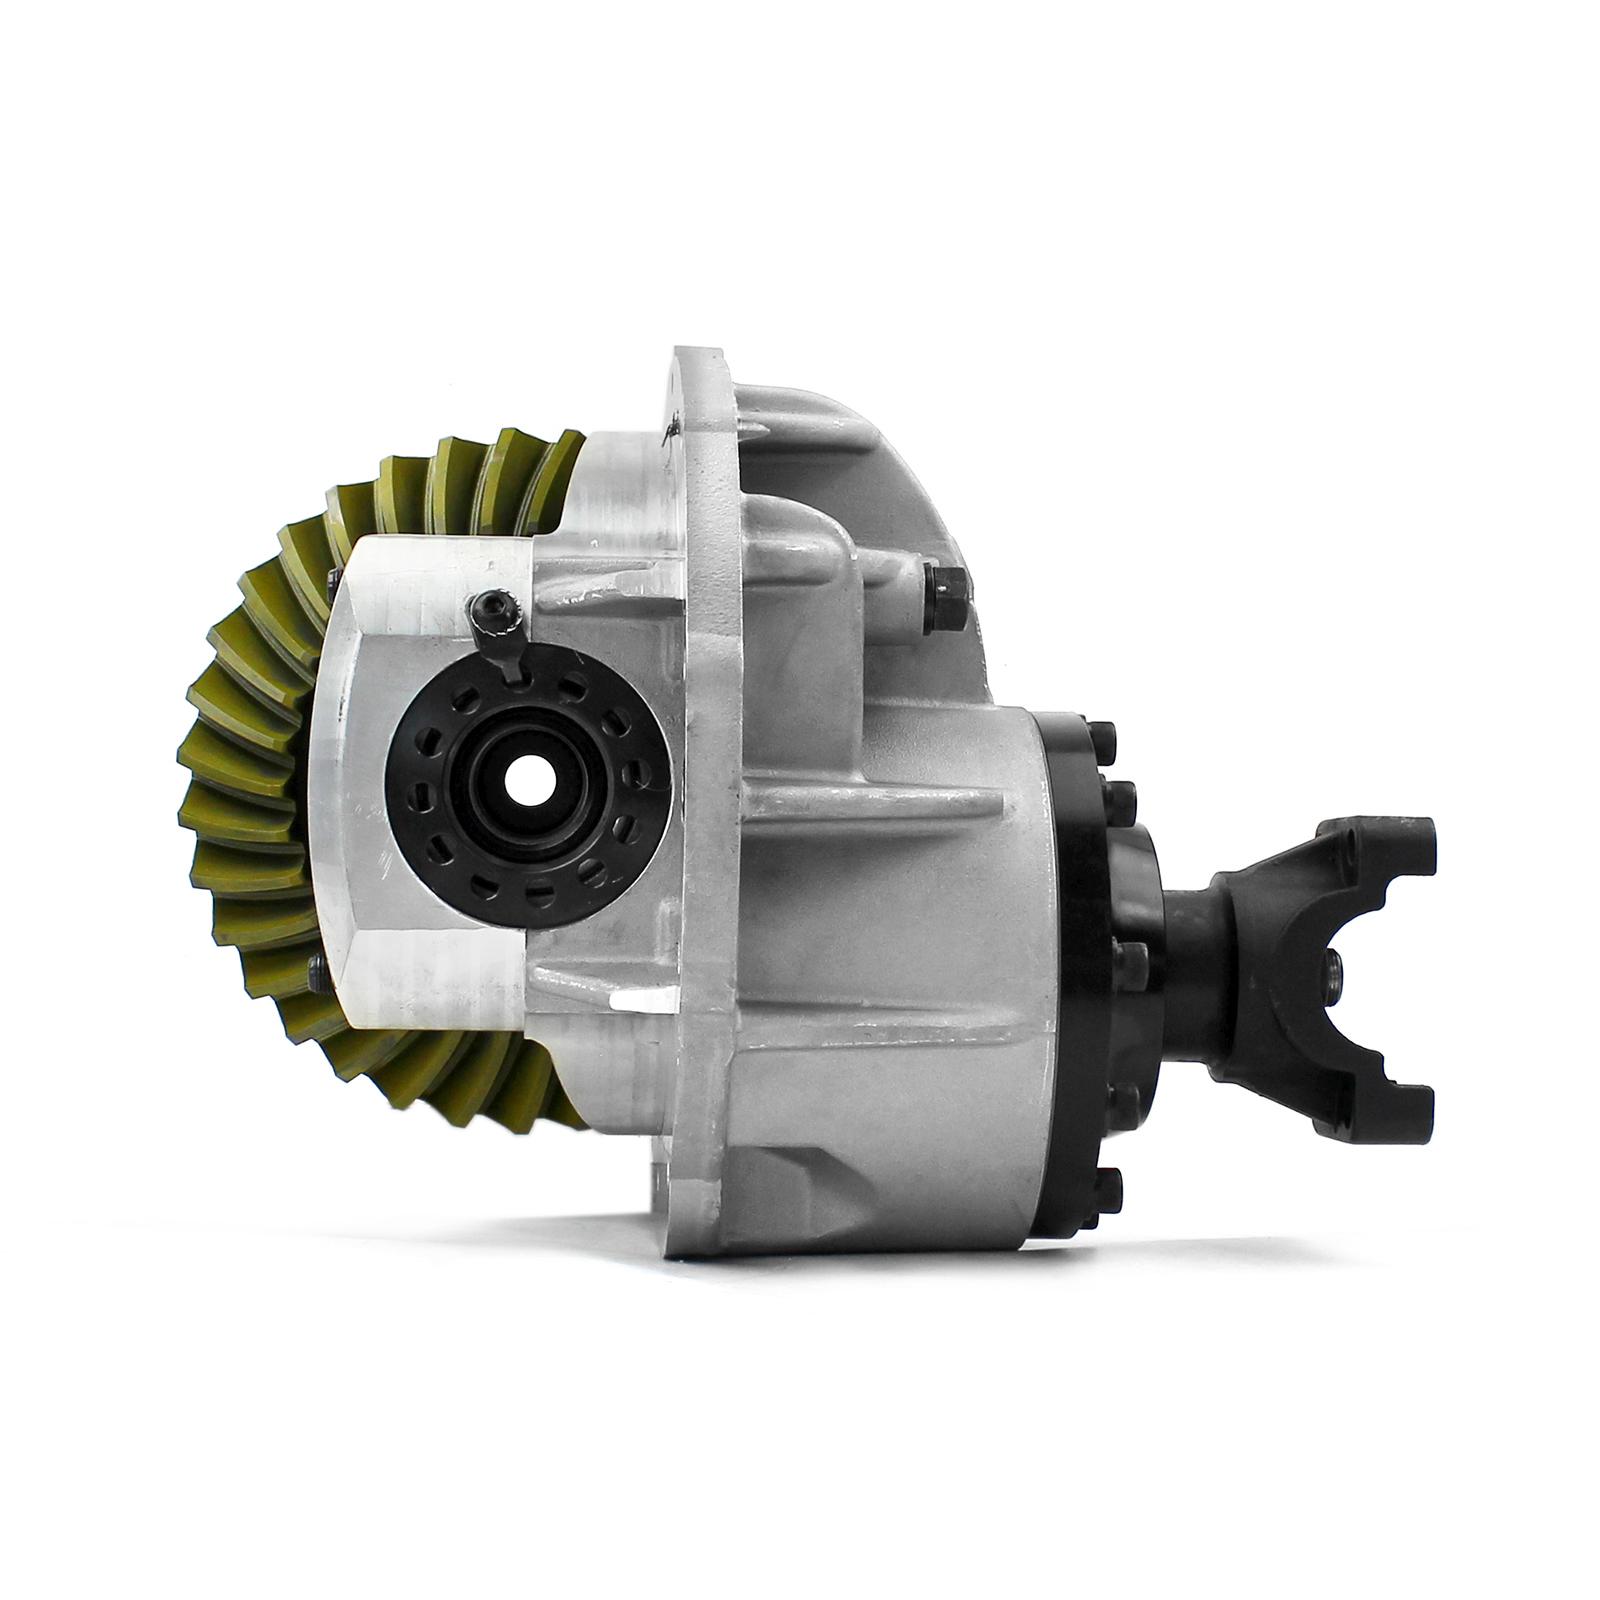 Speedmaster® 1-215-003 Ford 9 in. 31 Spline LSD TorqueWorm® Heavy-Duty Third Member Differential Center